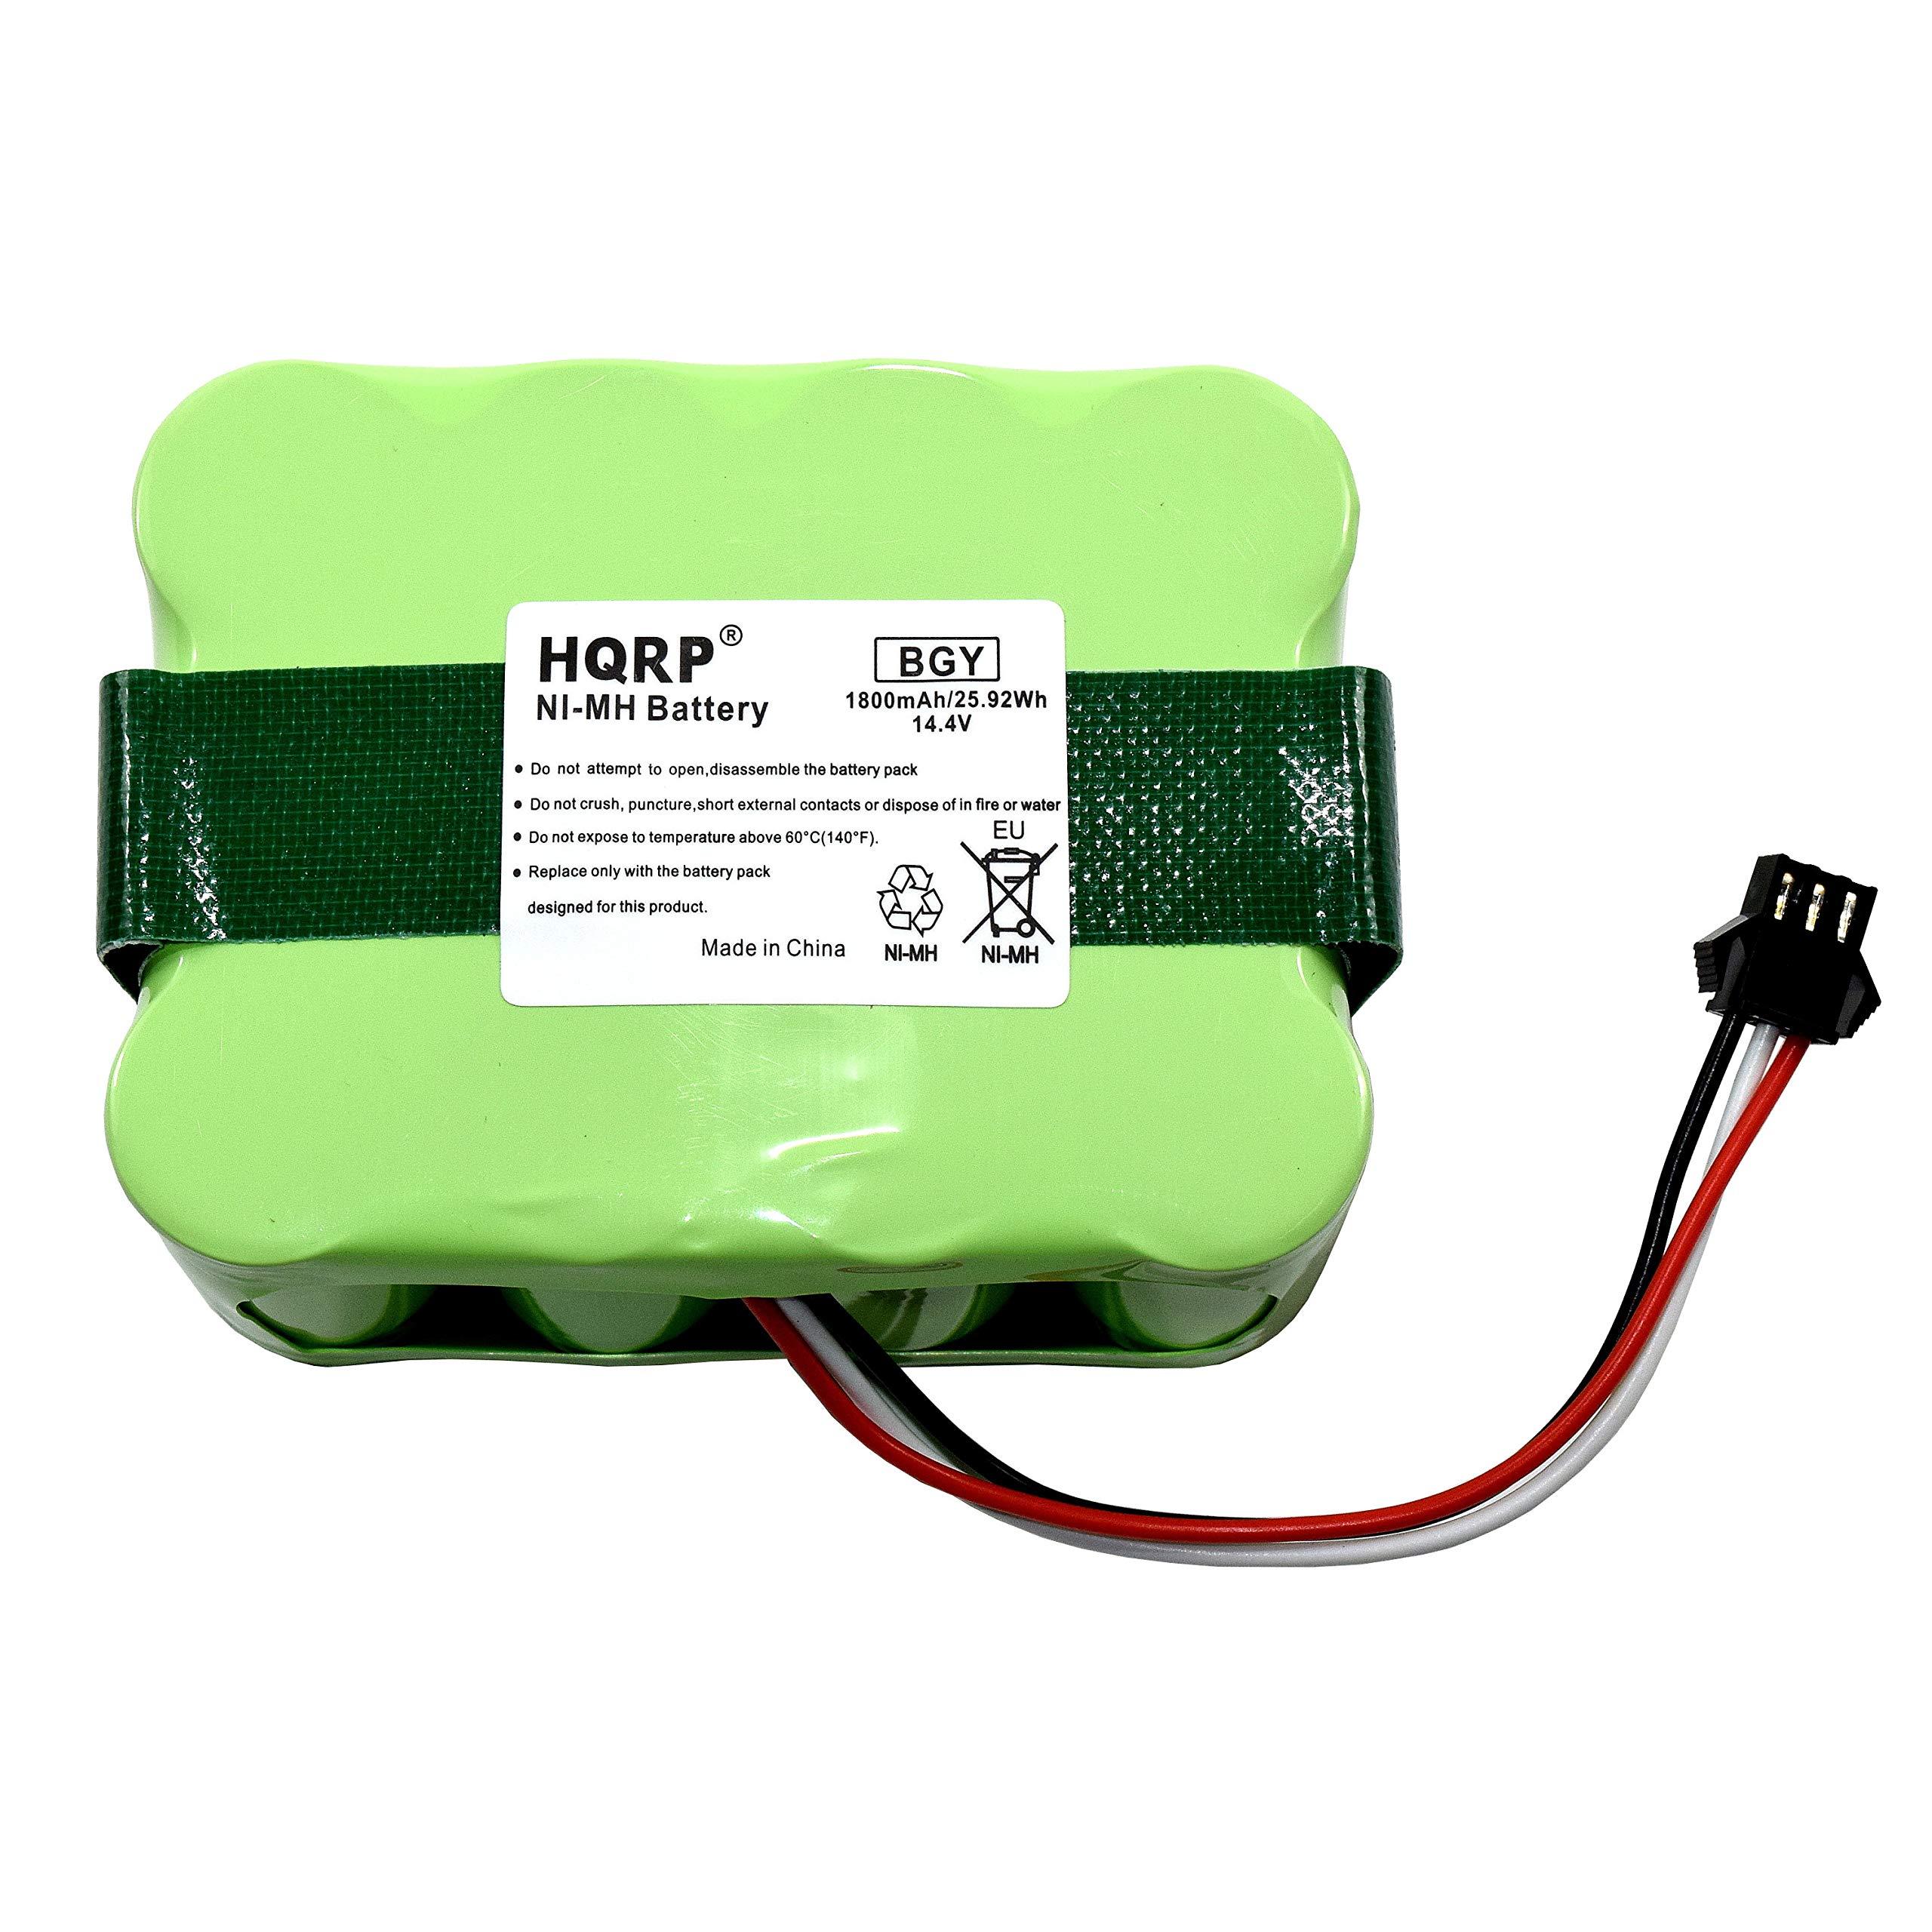 HQRP Battery for bObsweep Bobi Classic, BObi Pet Robotic Vacuum Cleaner, 00 Series, OO Series 017144-TN, BQBS1000, BQBS1003